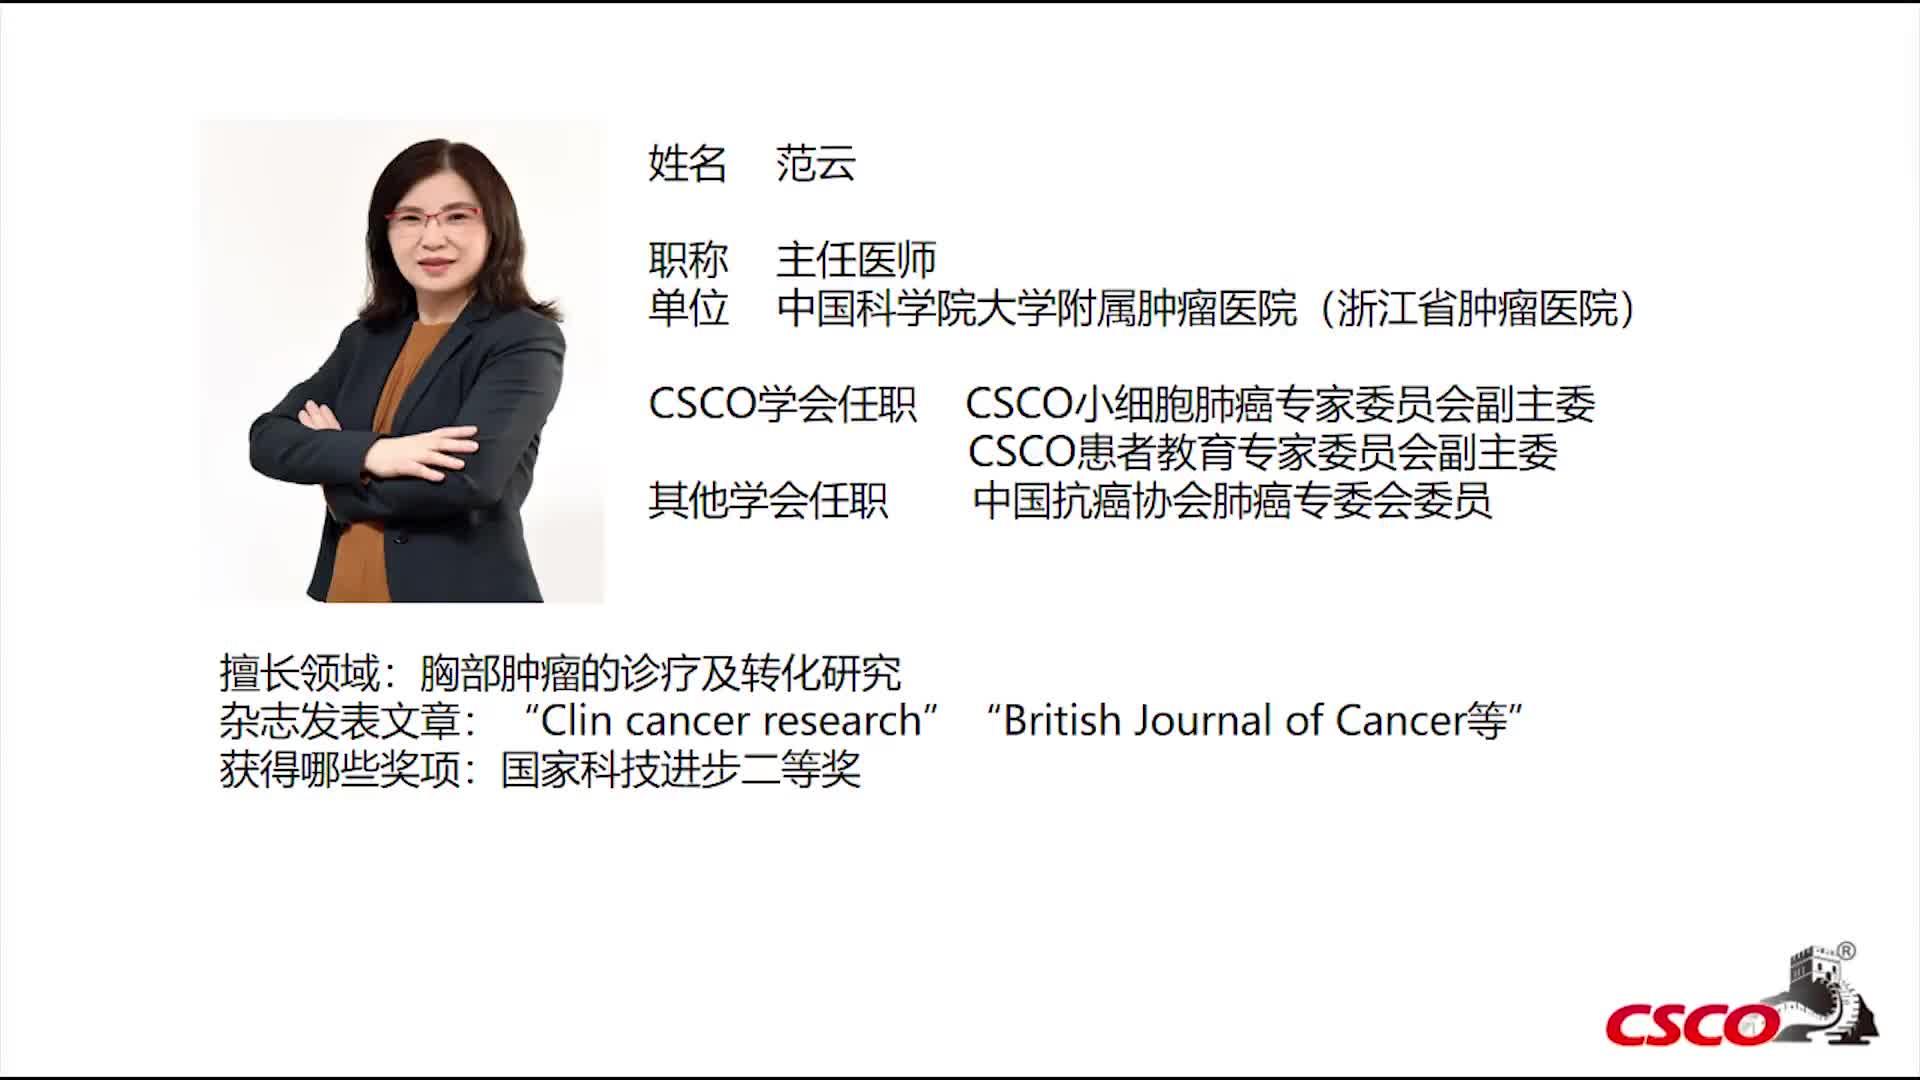 e-PRO在肿瘤患者管理中的现状及思考